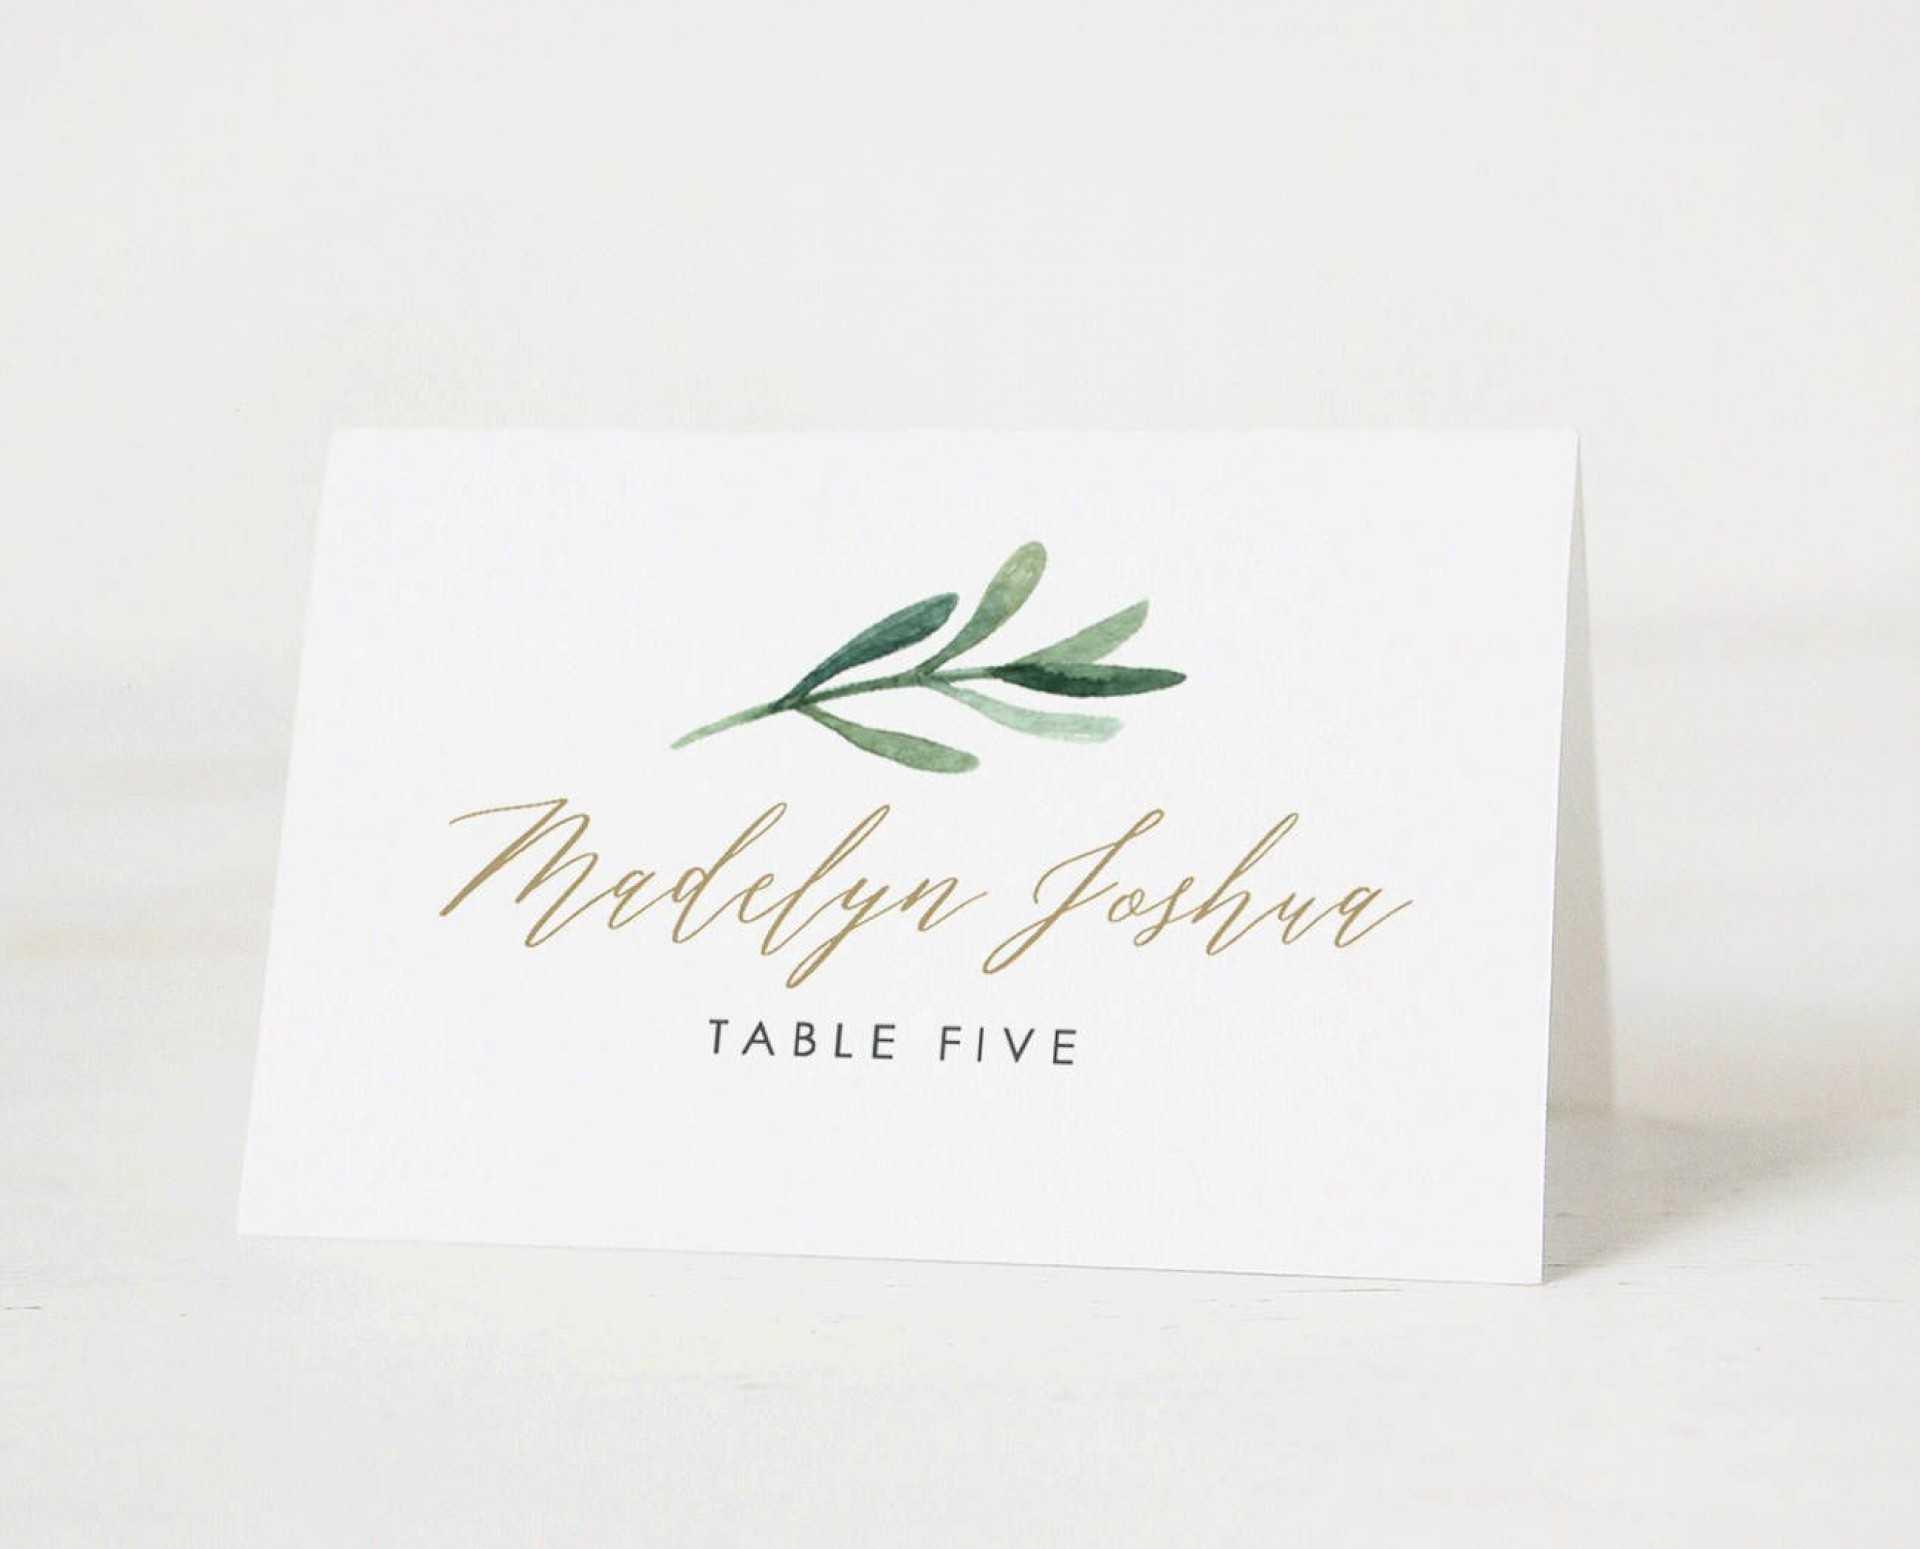 025 Template Ideas Free Printables Thanksgiving Place Cards Pertaining To Thanksgiving Place Cards Template